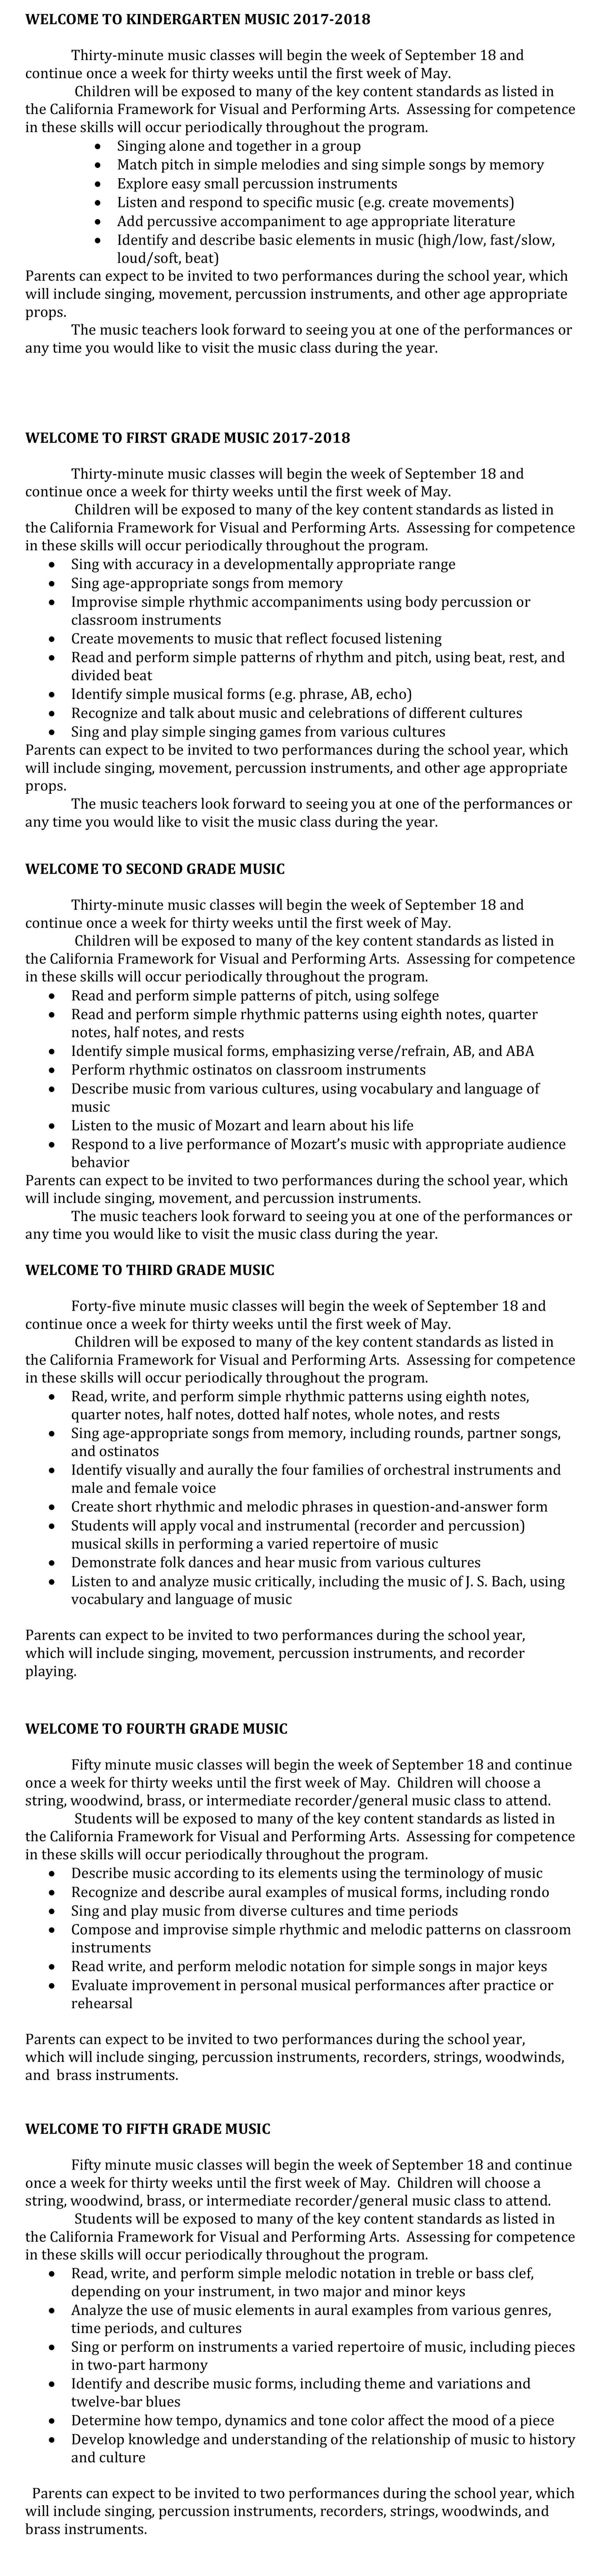 MusicContentStandards